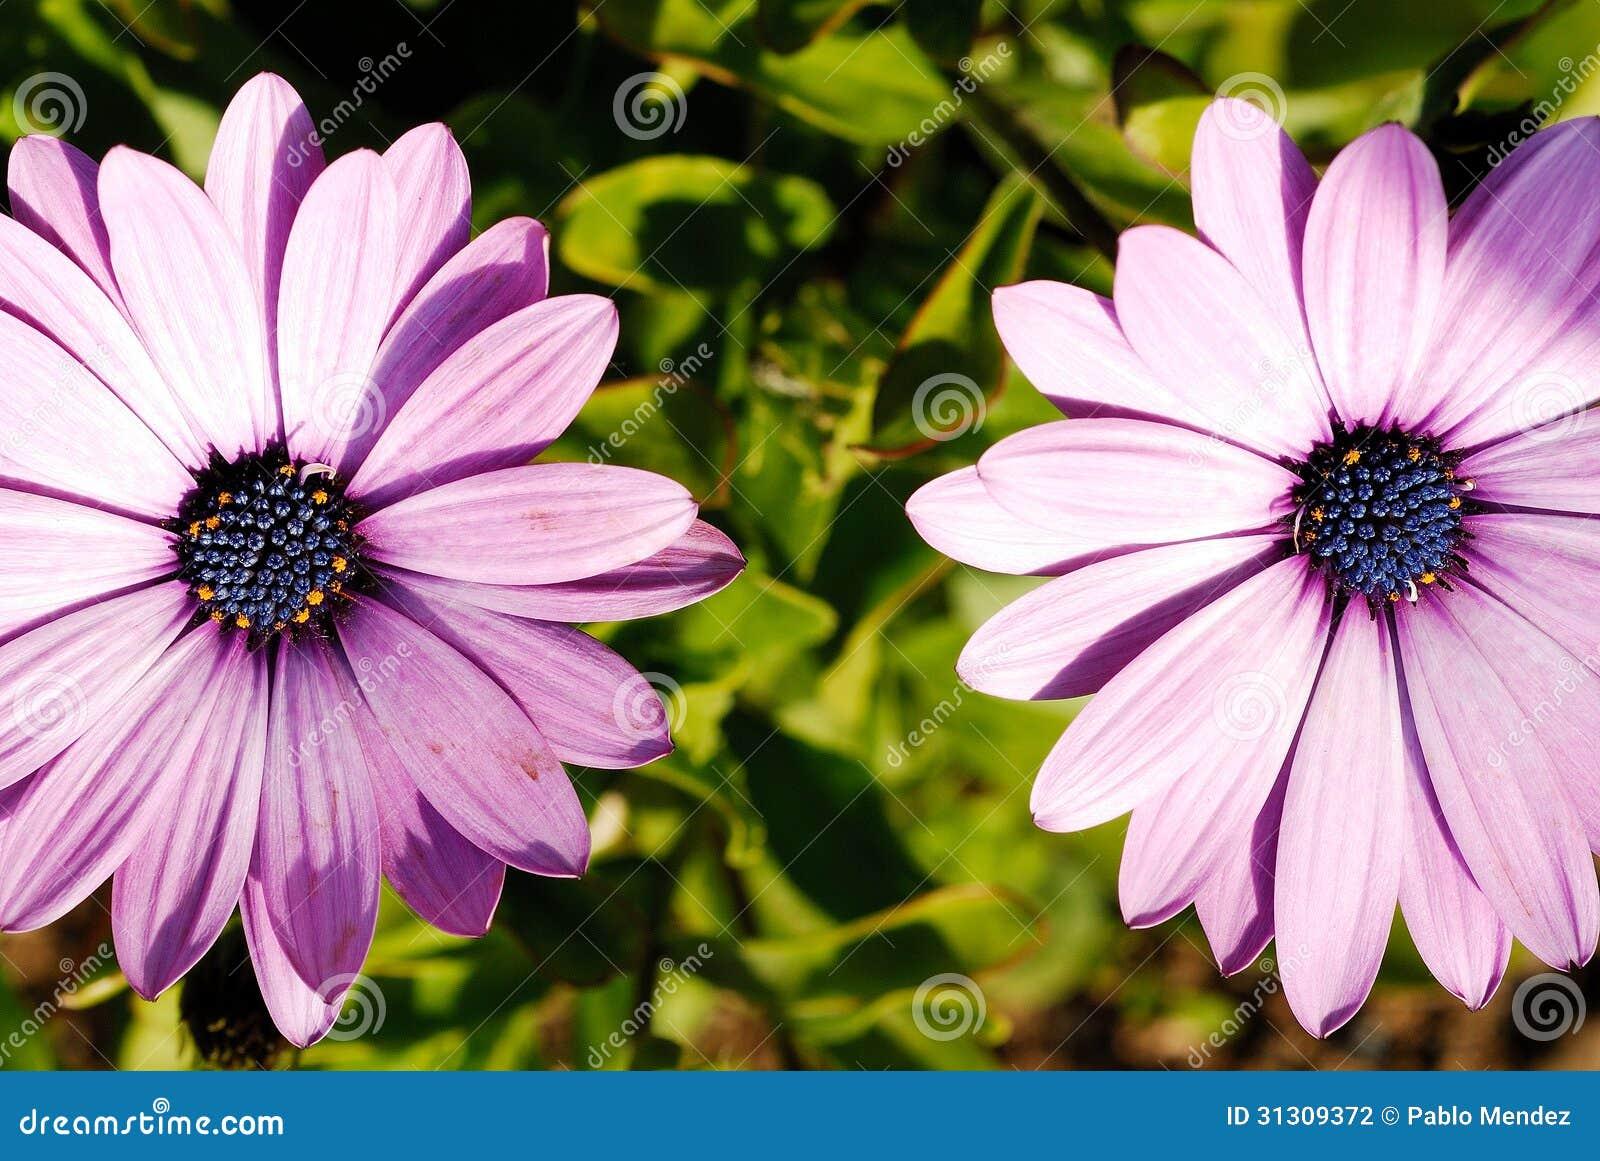 Fleur violette dans un jardin de reykjavik islande for Fleurs dans un jardin